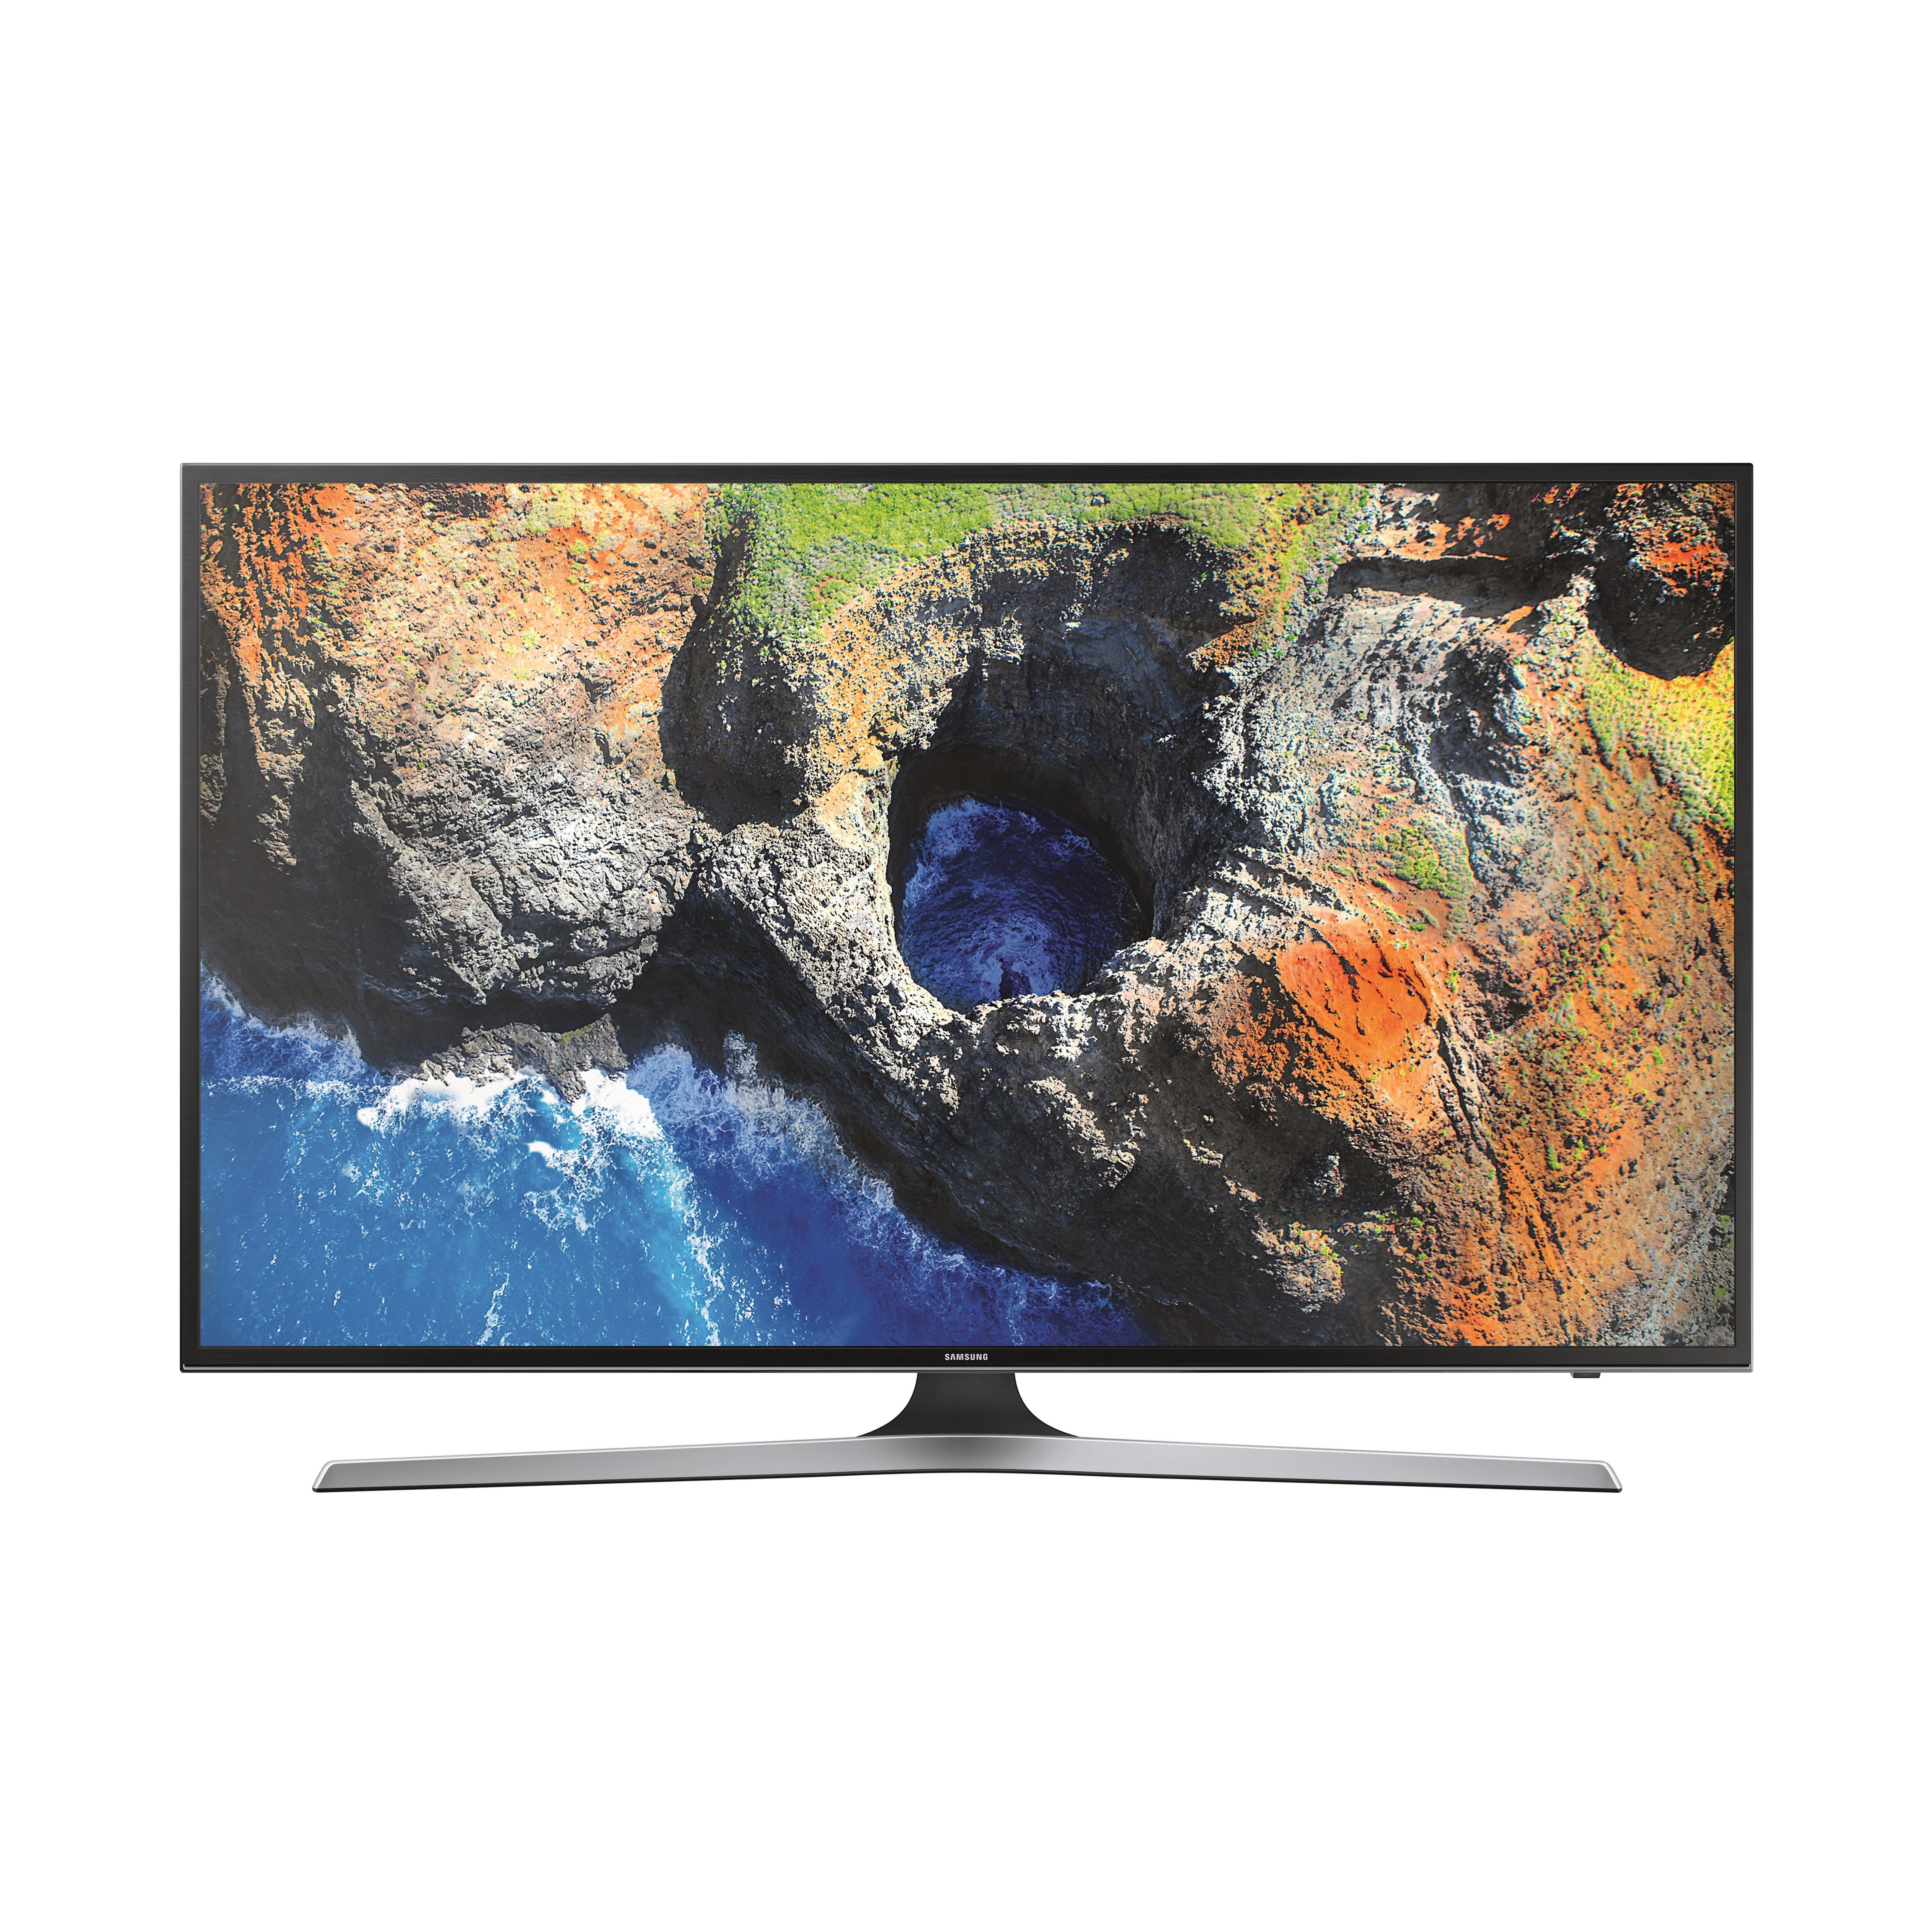 [NBB] Samsung UE65MU6170 Fernseher 163cm (65 Zoll) (UHD Dimming, HDR, Smart TV, PQI 1300, PurColor, DLNA)